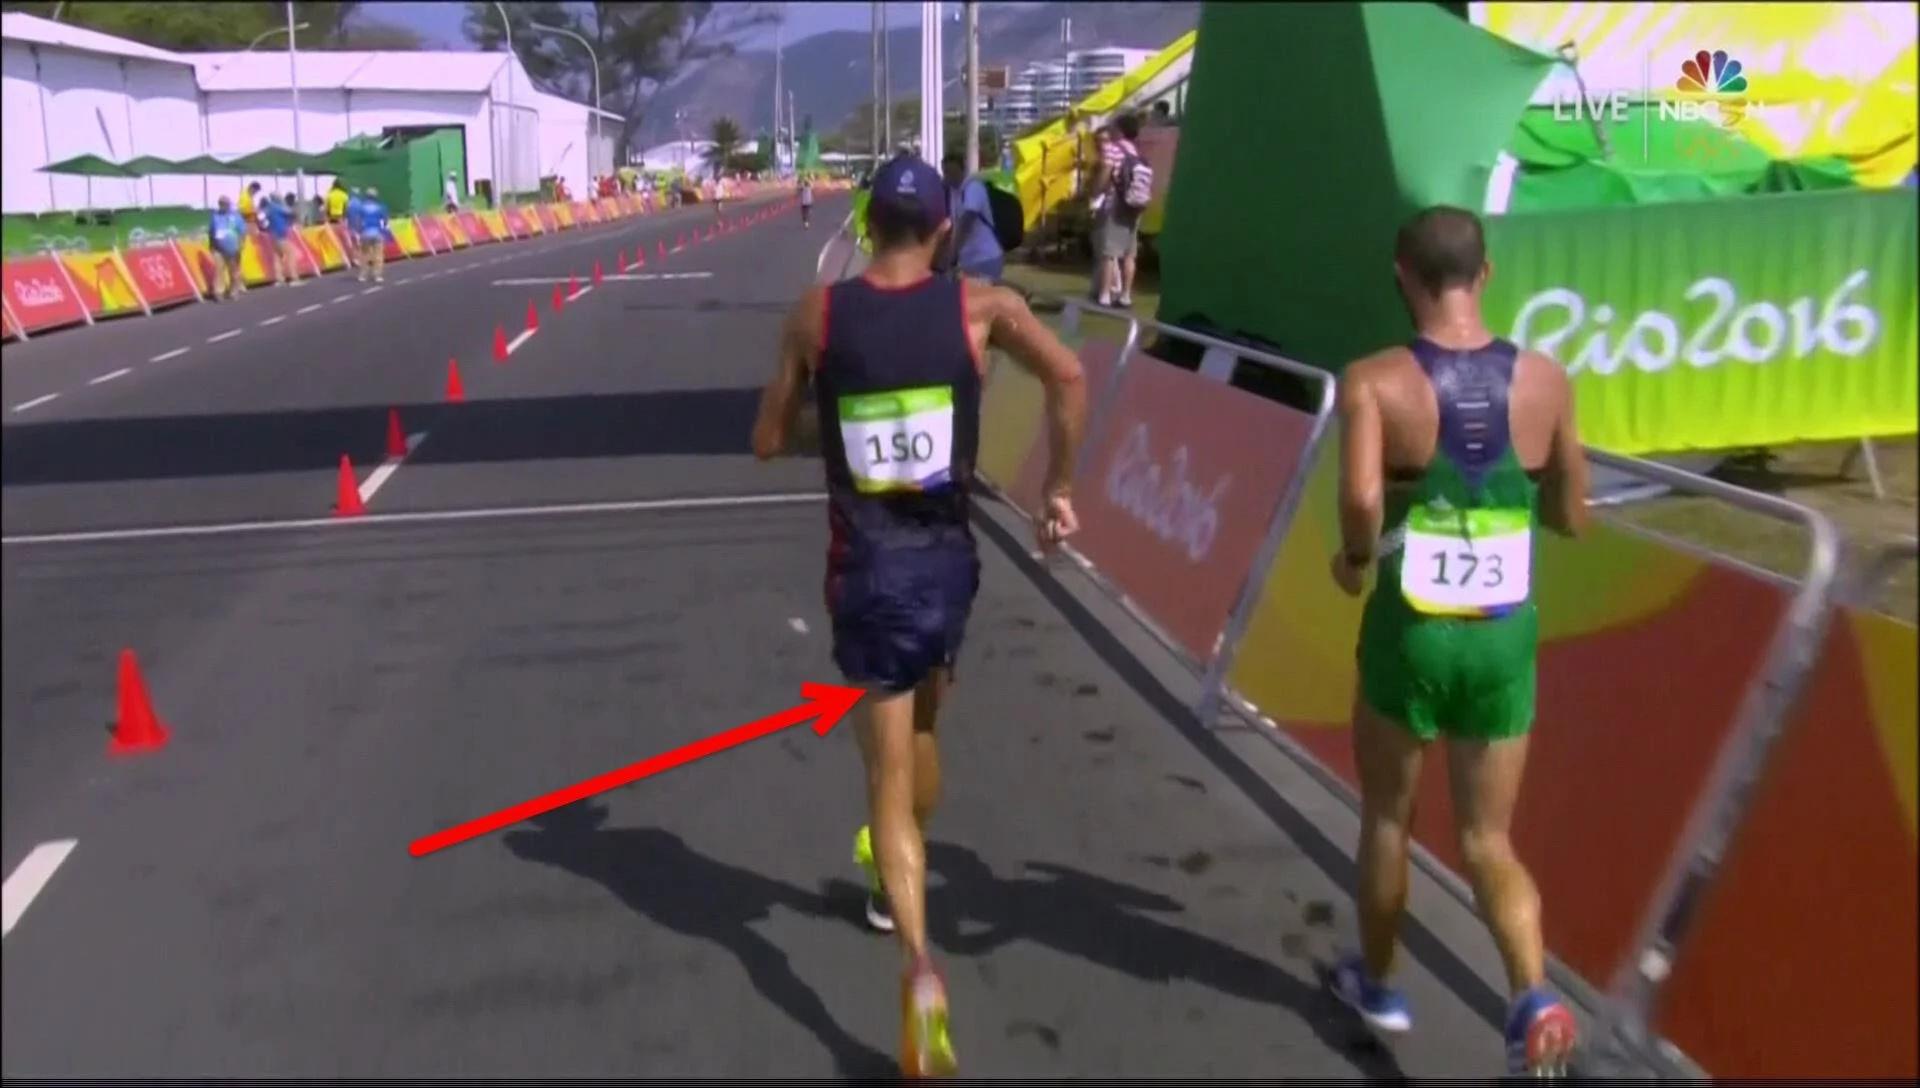 Yohann Diniz poops on himself during the 50km walk race